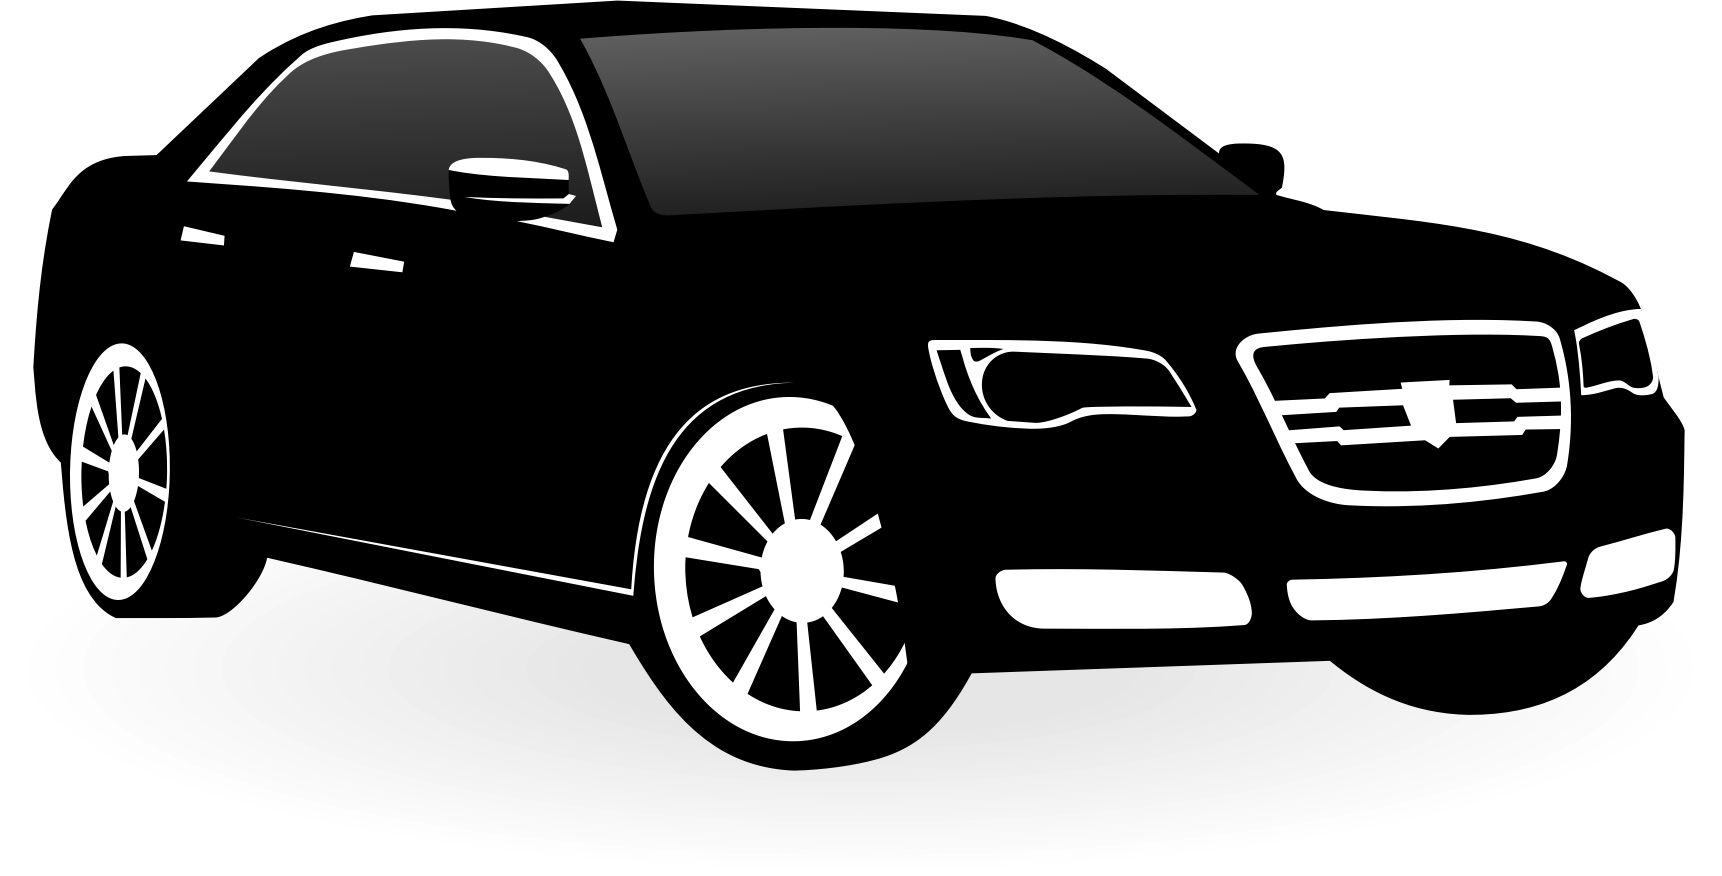 Chrysler c big image. Fog clipart vector